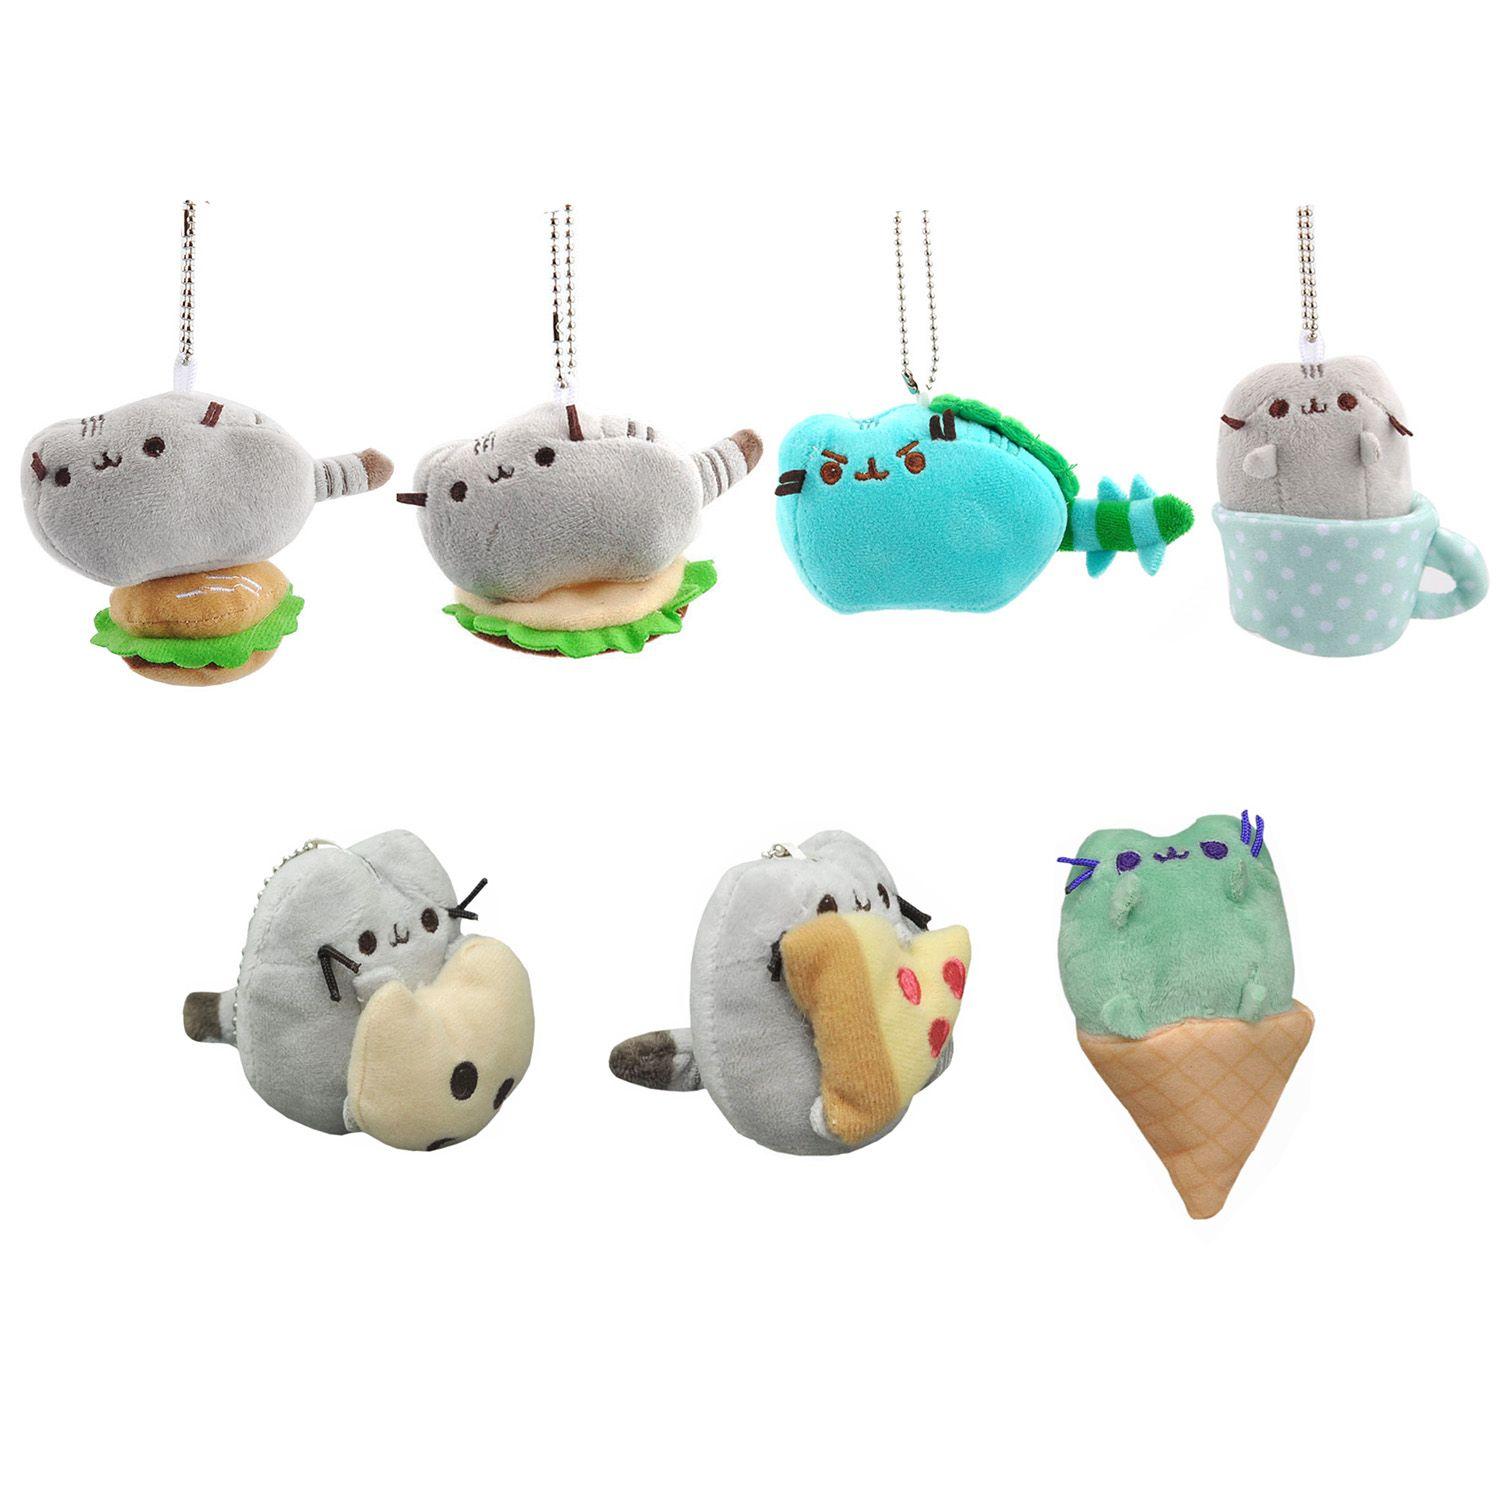 "Top New 7 Styles 3"" 8CM The Cat Cookie Icecream Pizza Hamburger Dinosaur Dino Glass Taco Plush Doll Anime Stuffed Keychains Gifts Soft Toys"